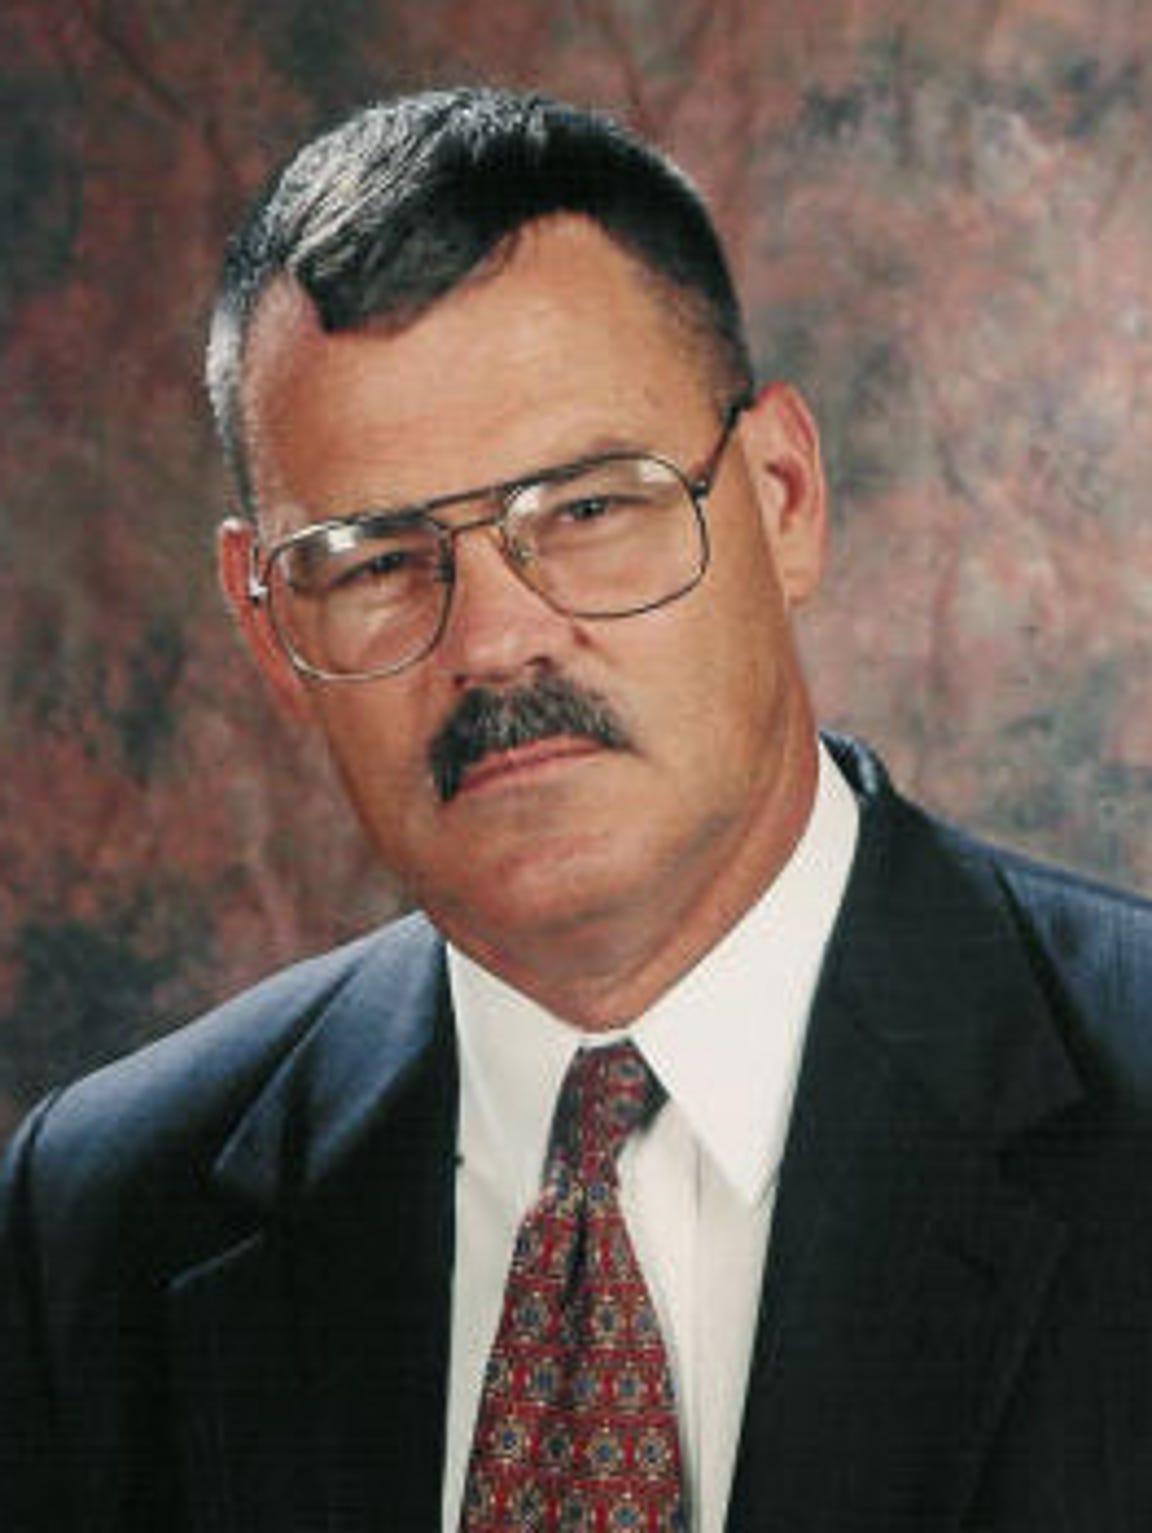 FBI whistleblower Frederic Whitehurst is credited with